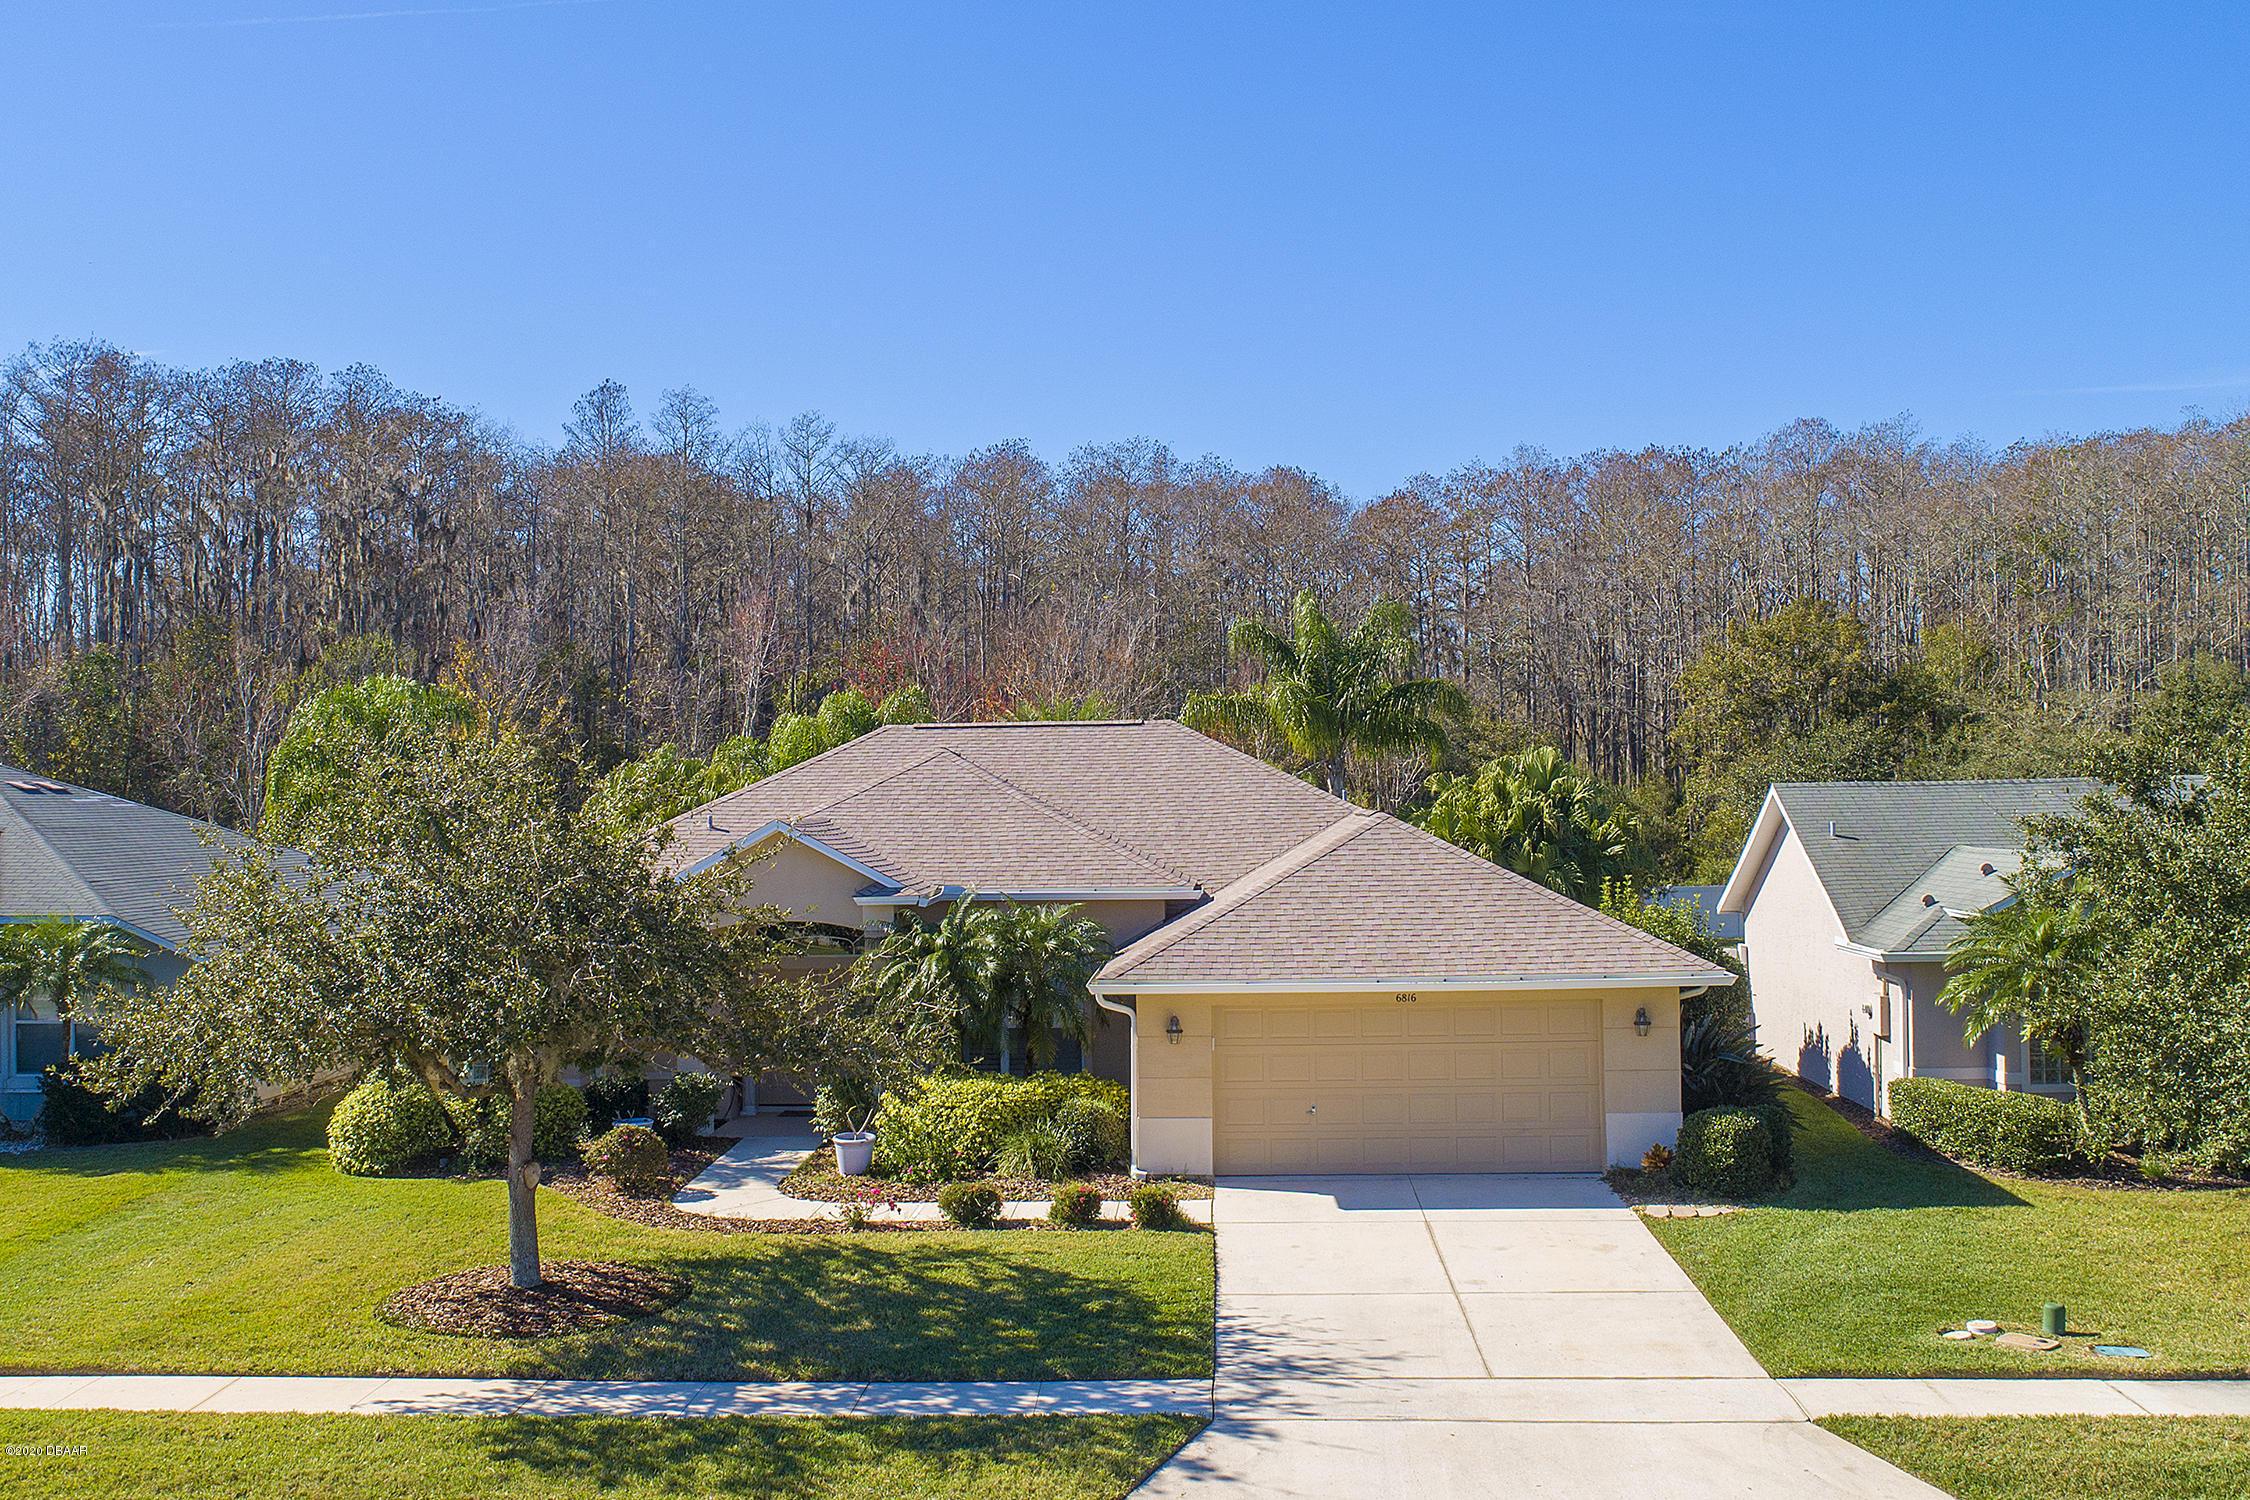 Photo of 6816 Stoneheath Lane, Port Orange, FL 32128